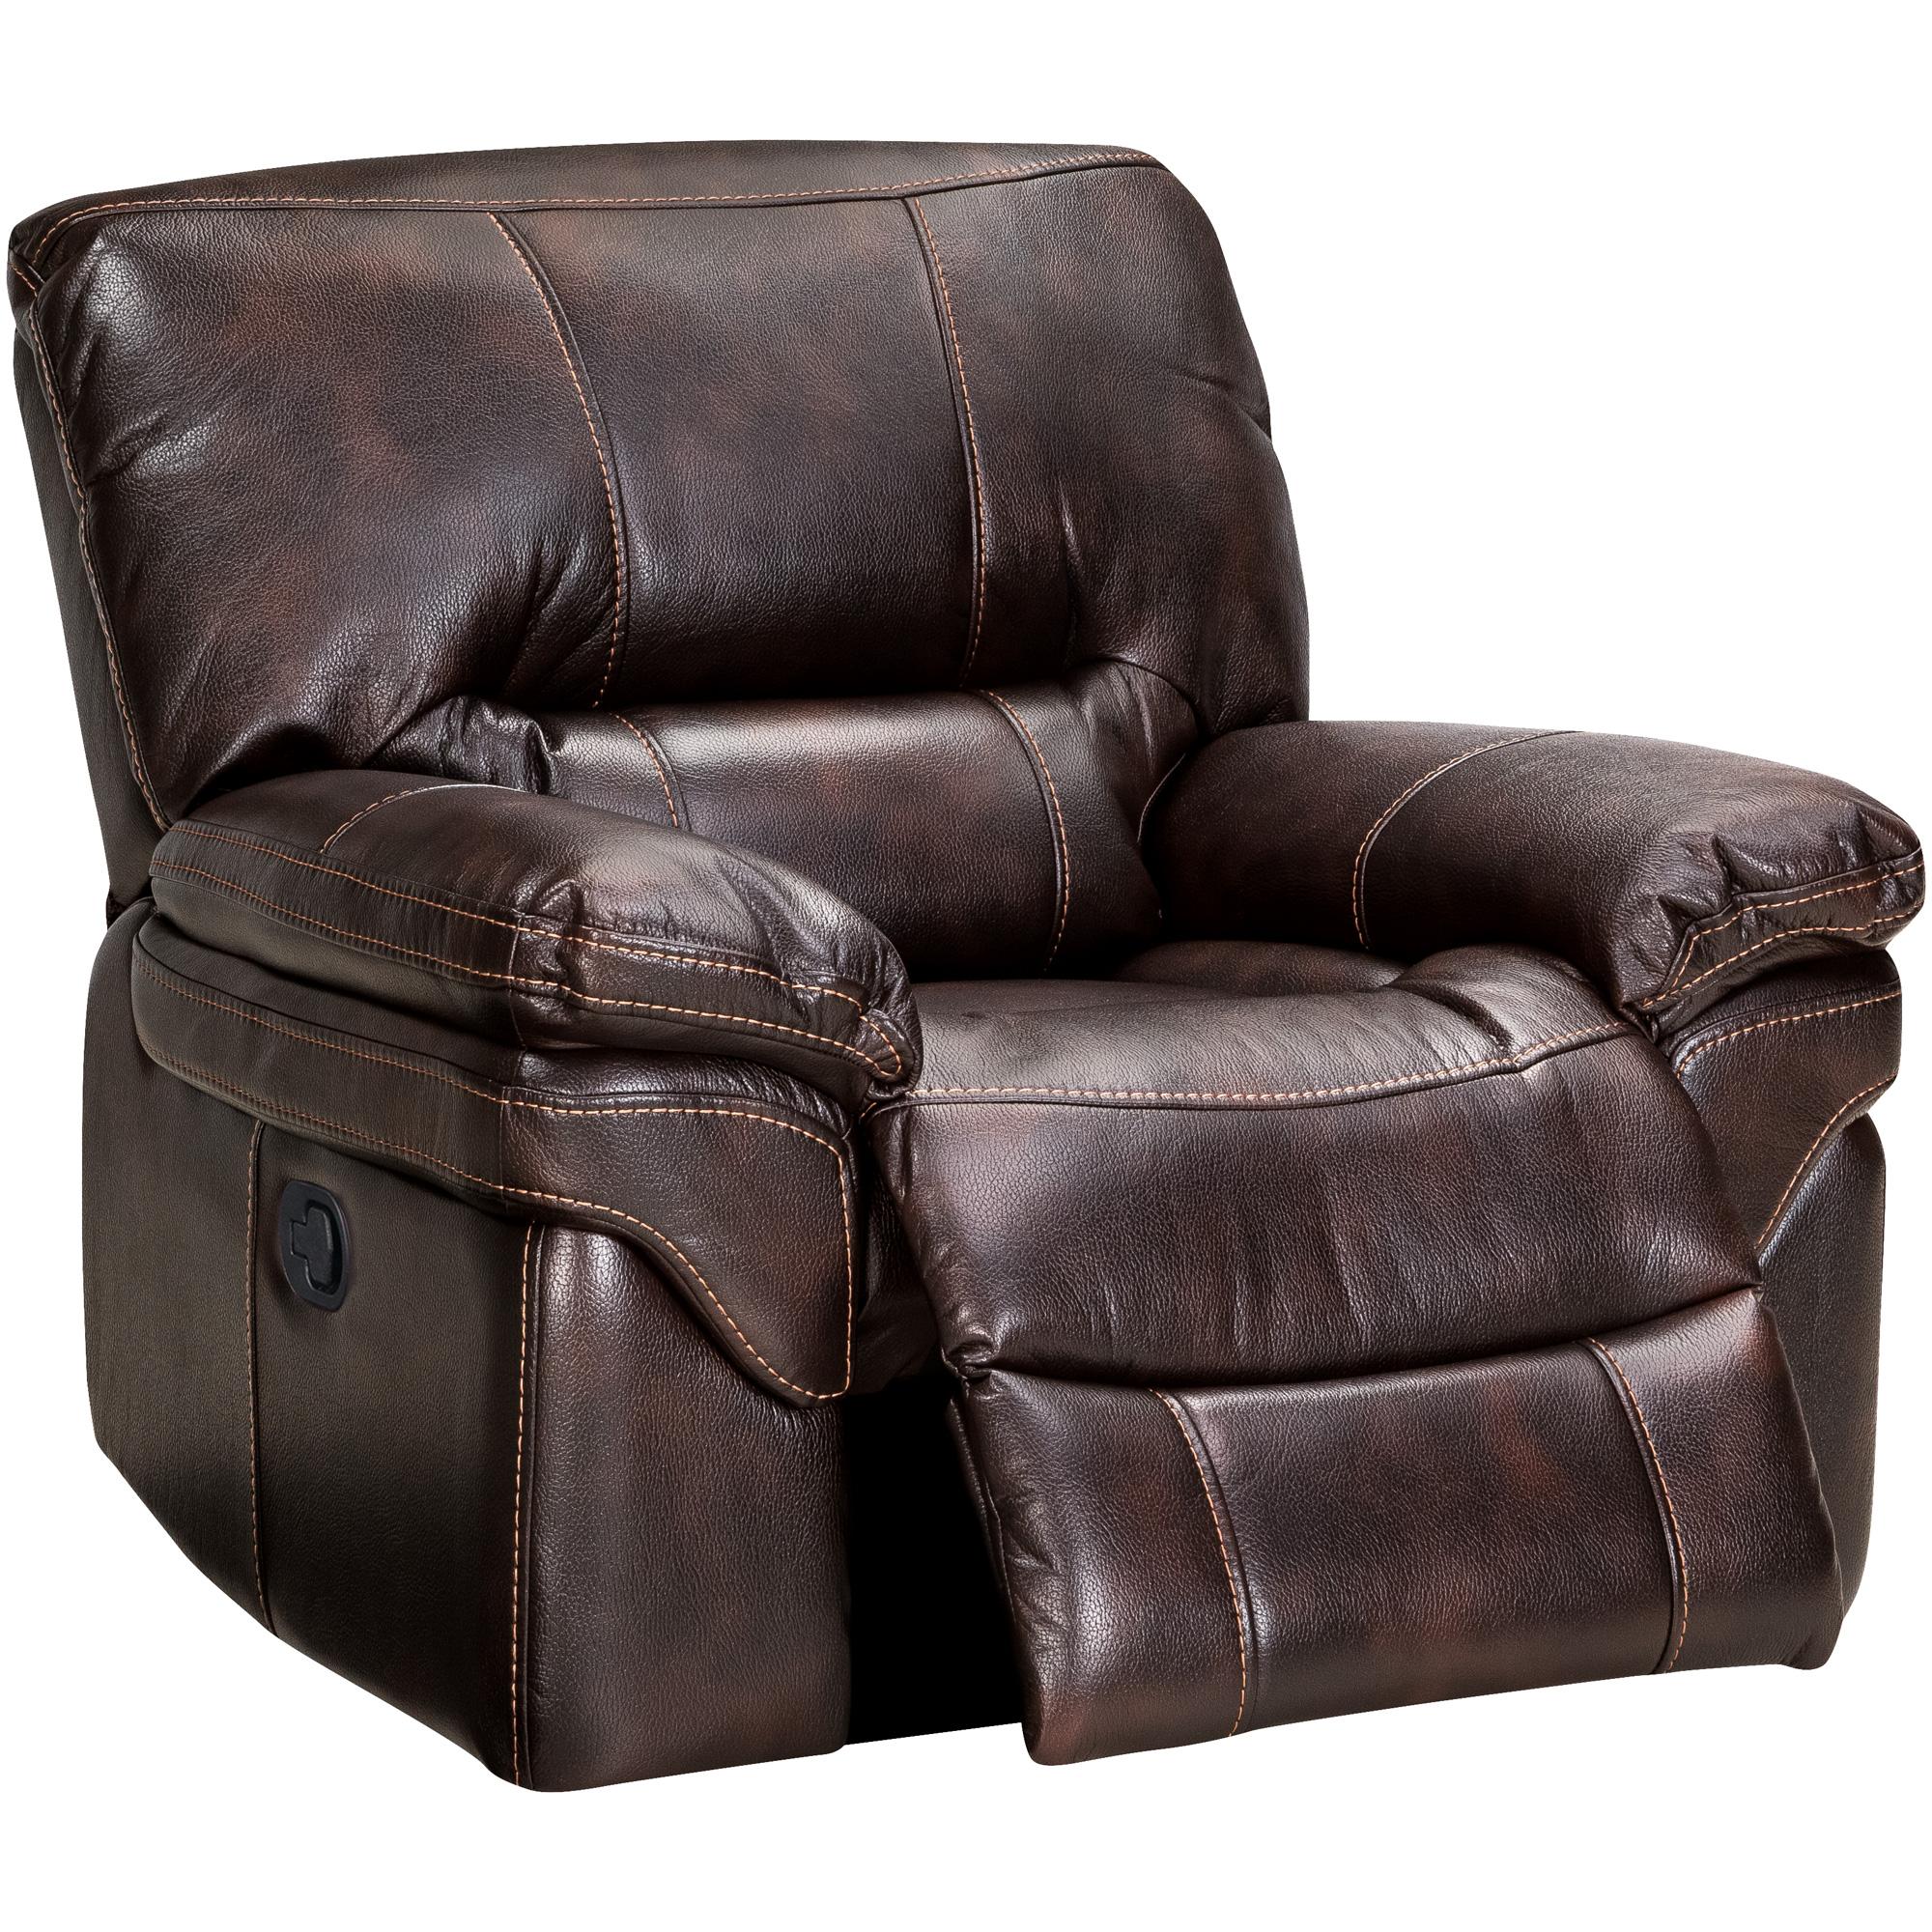 Wah Cheers | Valdez Brown Glider Chair Recliner